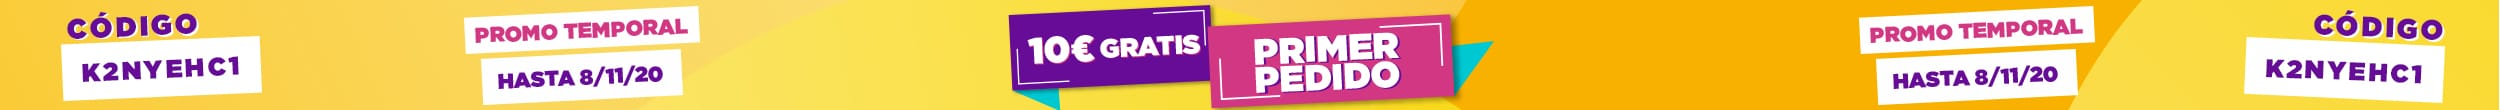 Promo temporal 10€ gratis imprenta online